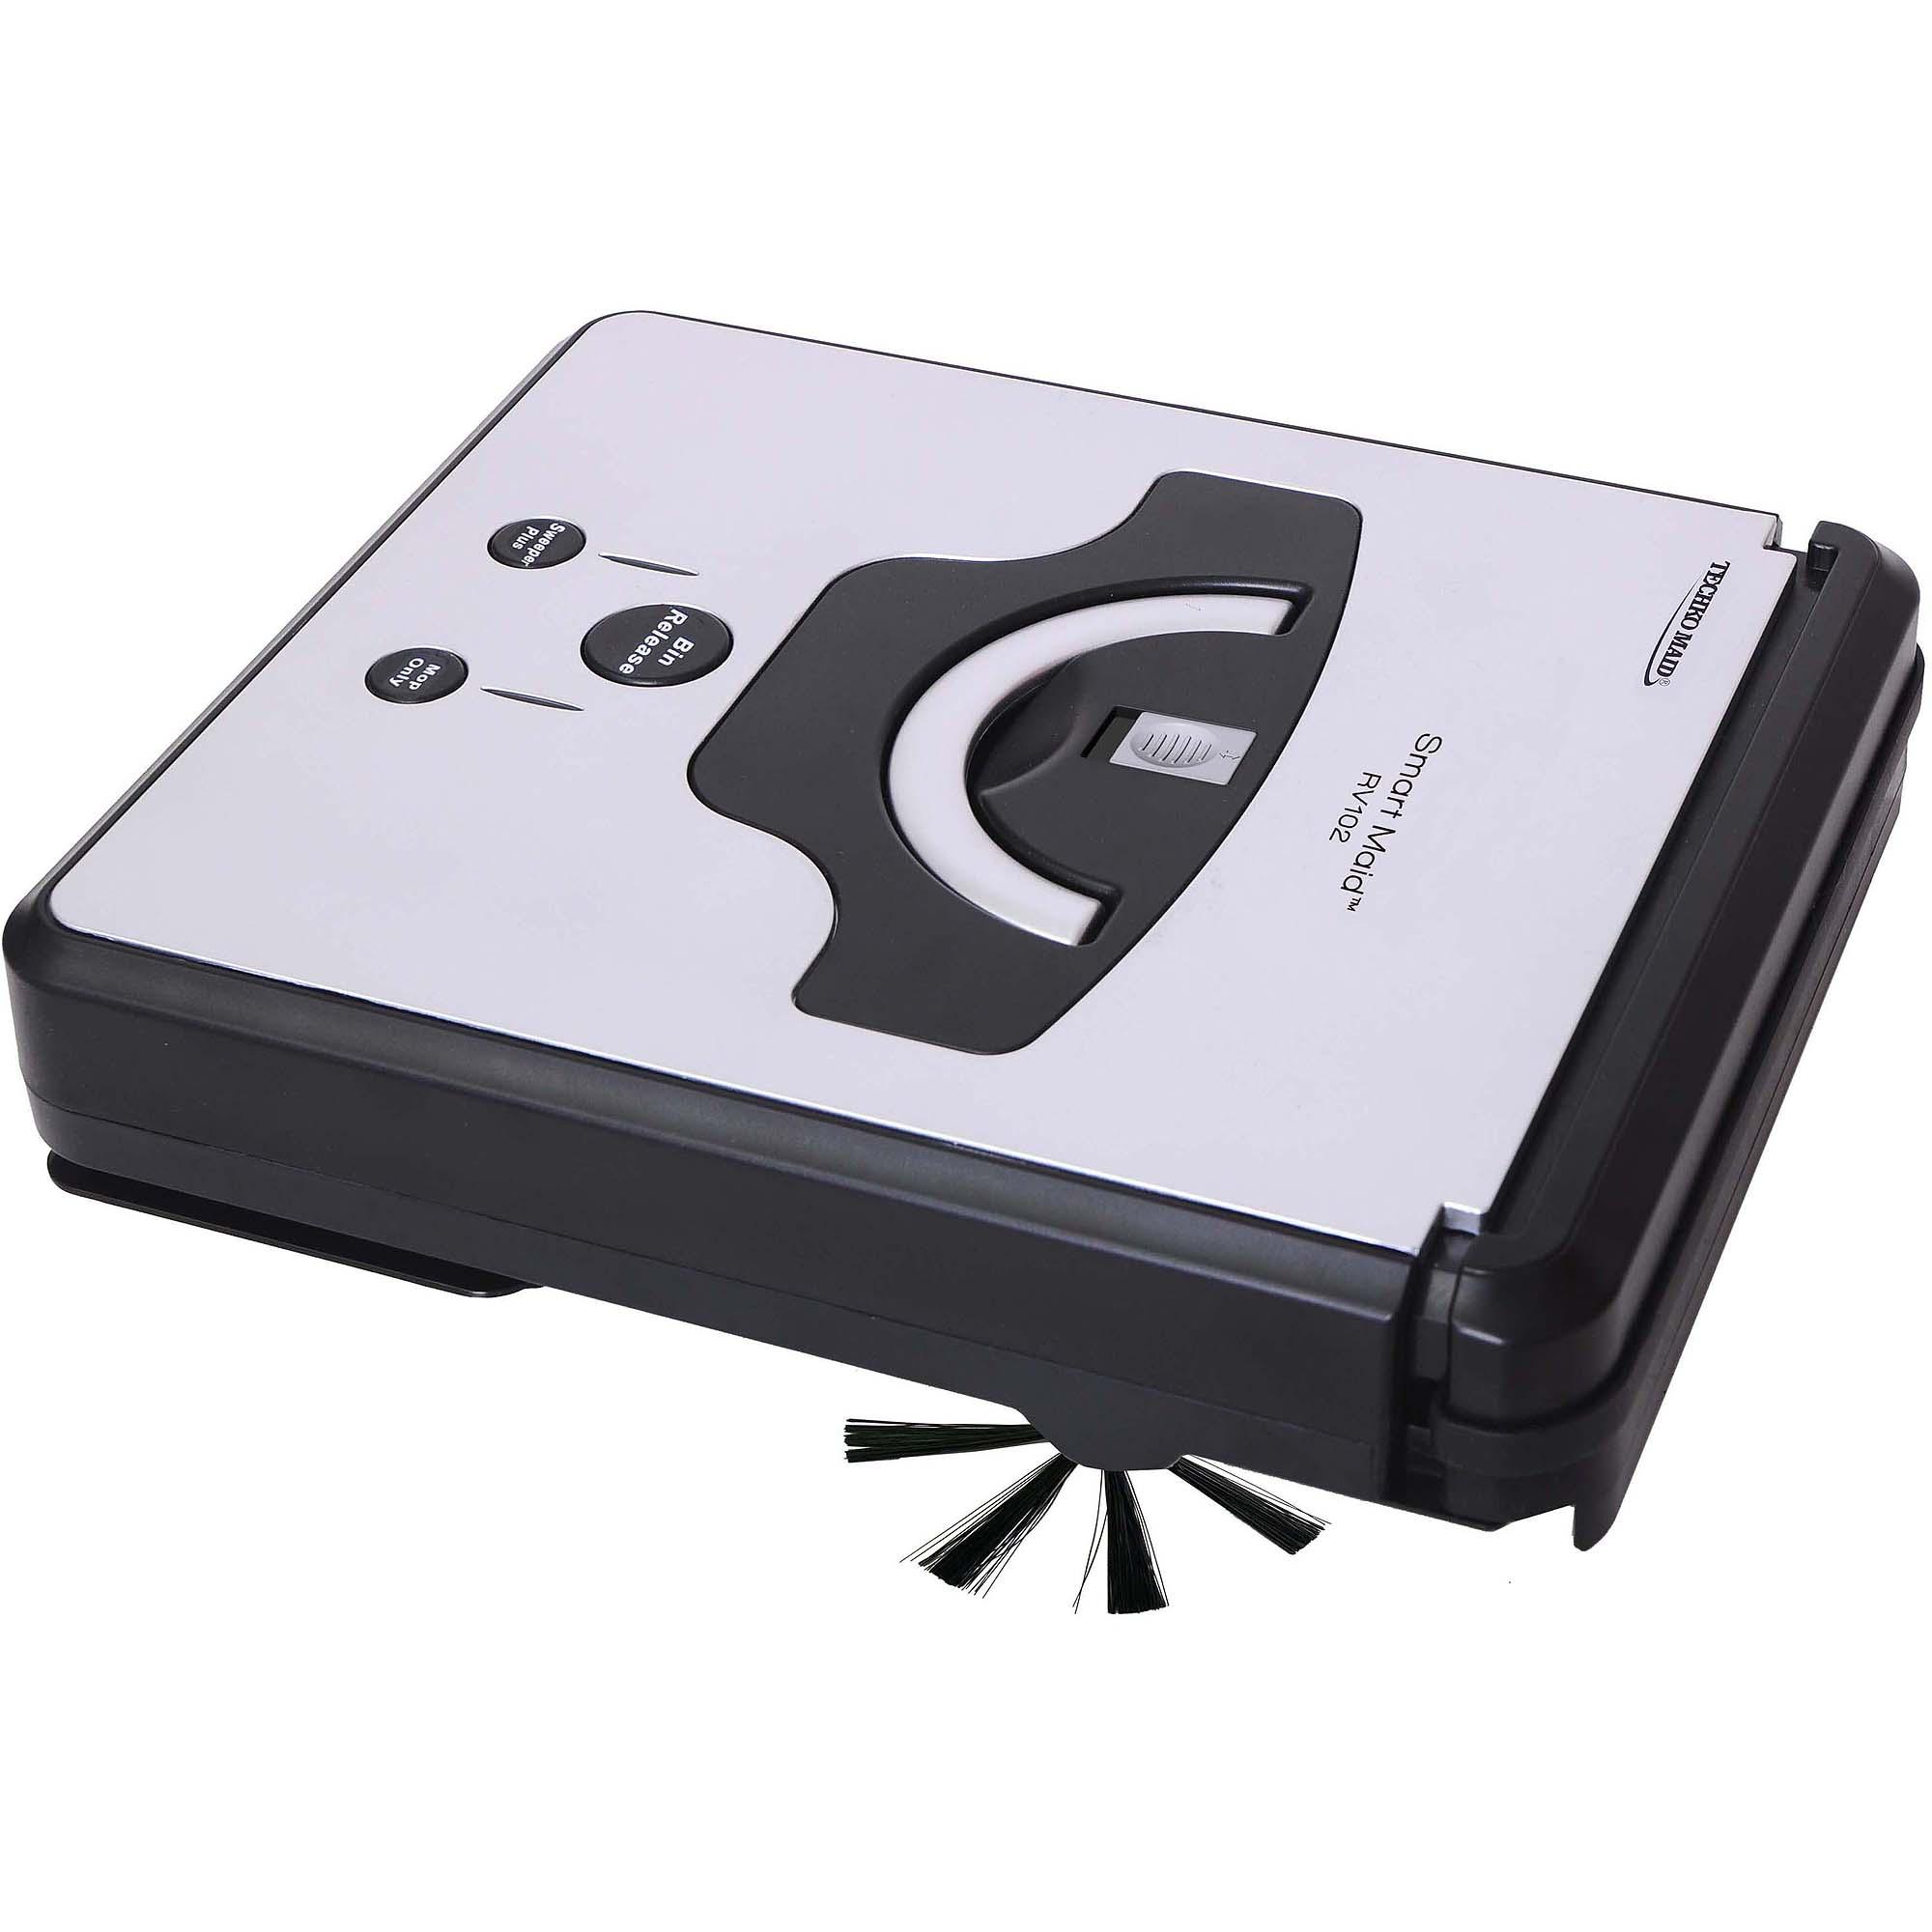 Techko Maid Robotic RV102 Robotic High Sweeper & Mopping Machine, Silver